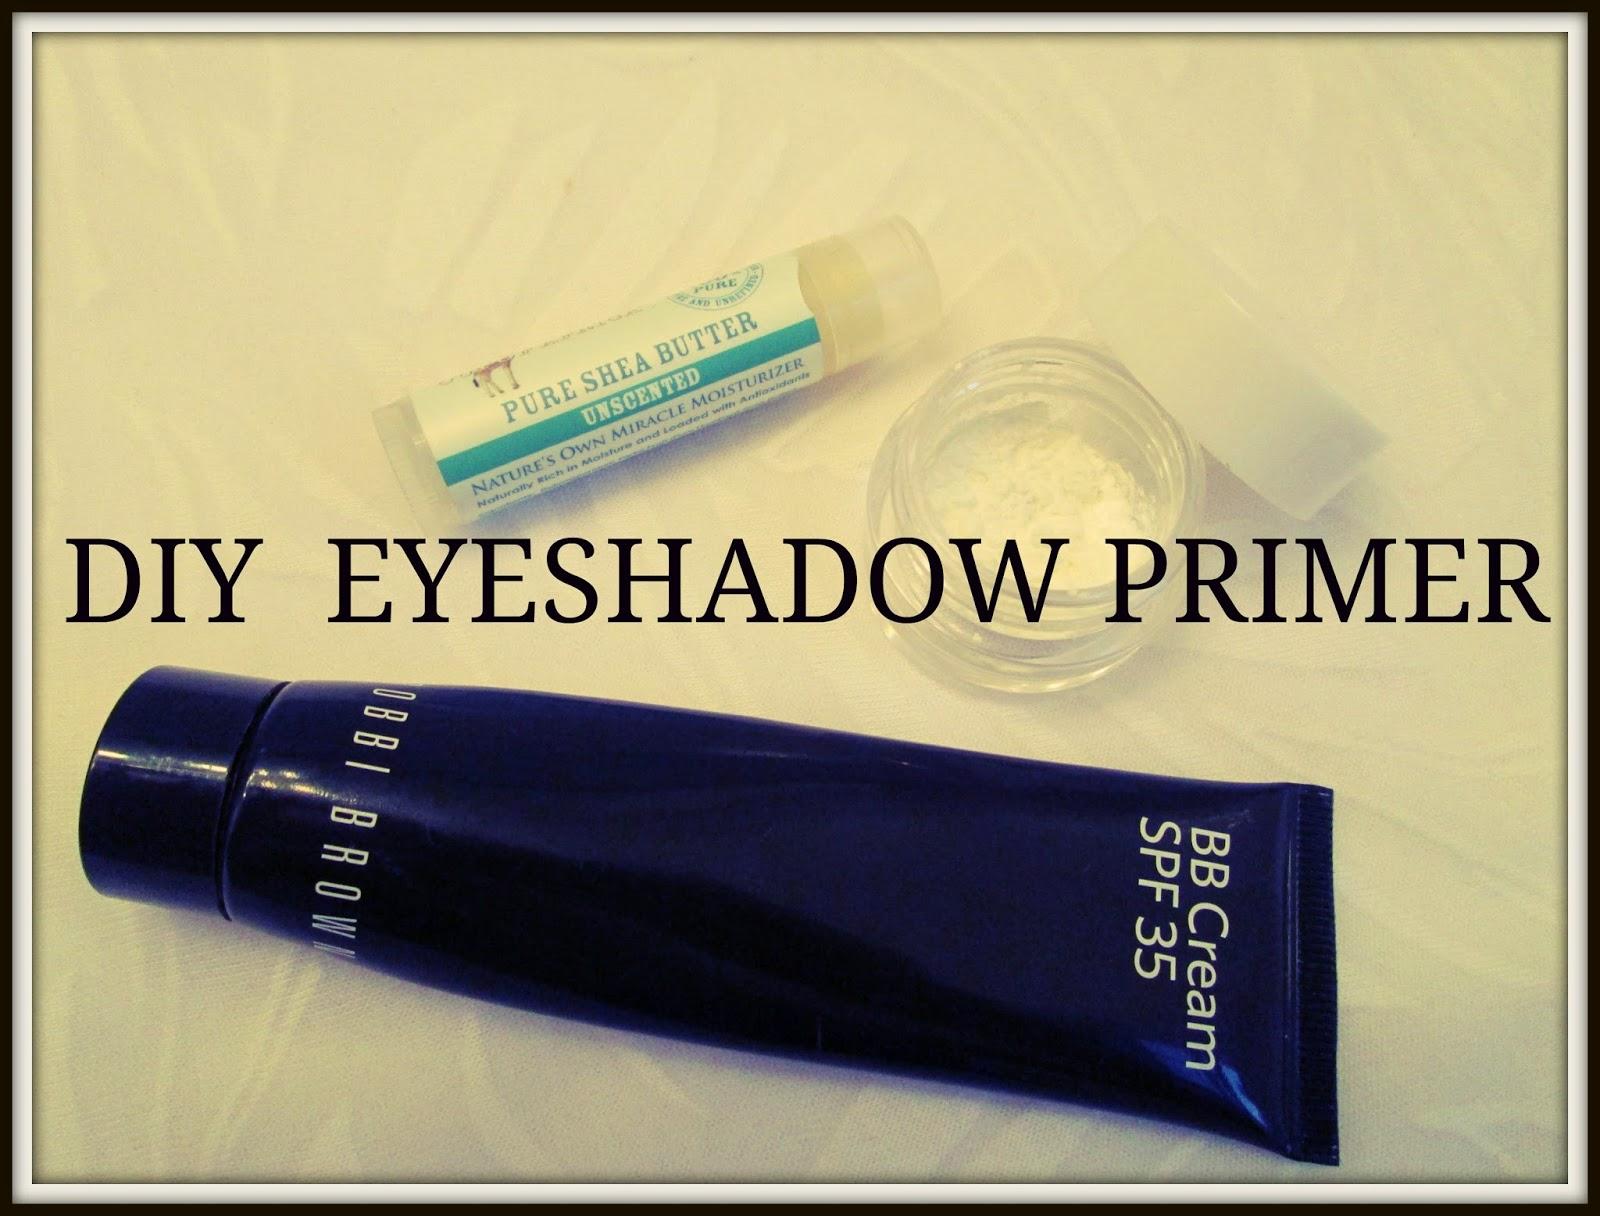 http://chrysalisglam101.blogspot.com/2014/08/diy-eyeshadow-primer.html